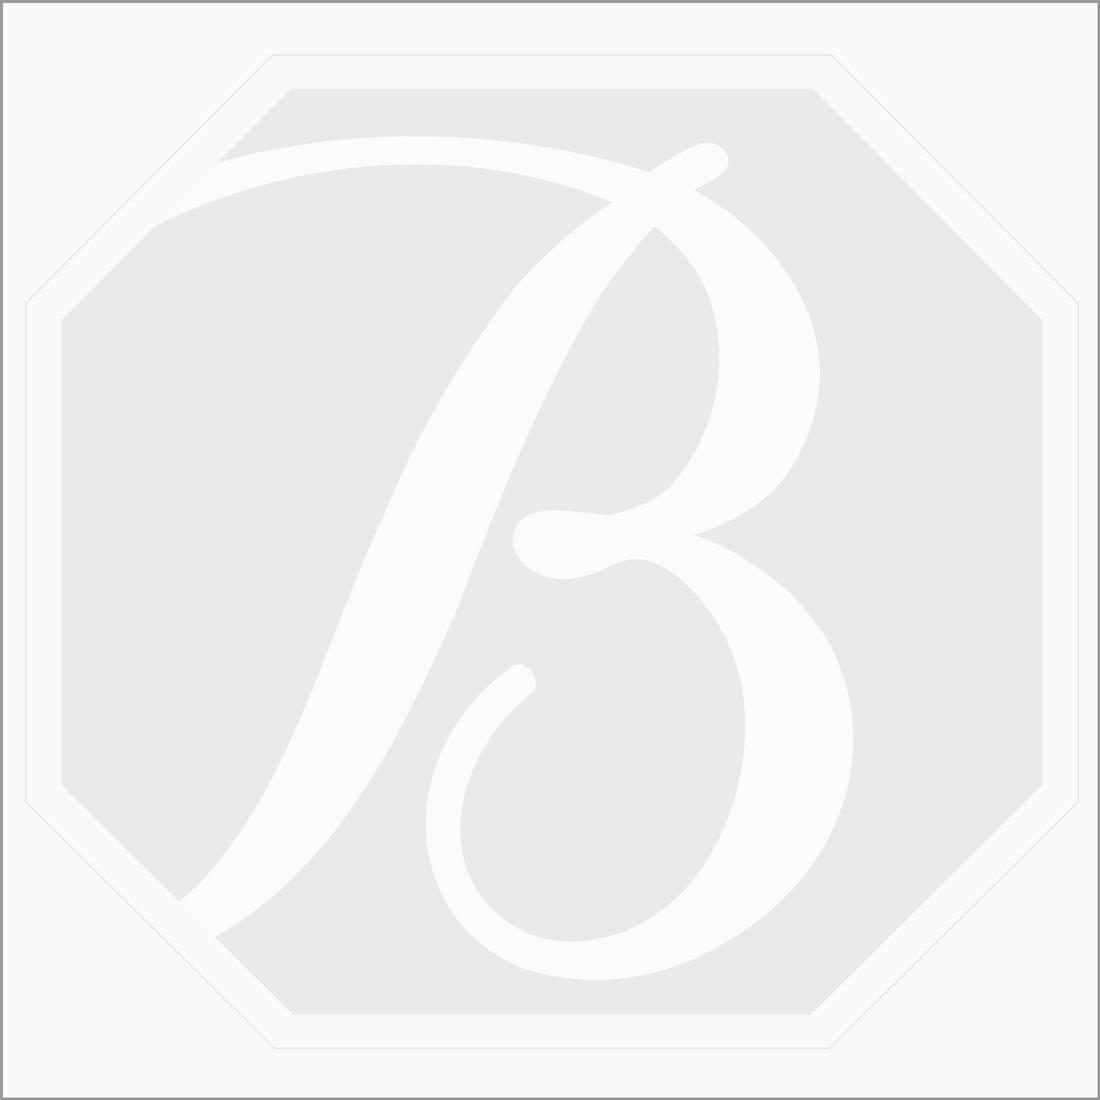 6 Pieces - Medium Tones Multi-Sapphire Rose Cut - 21 x 17 mm to 25 x 17.50 mm - 183.64 carats (MSRC1294)